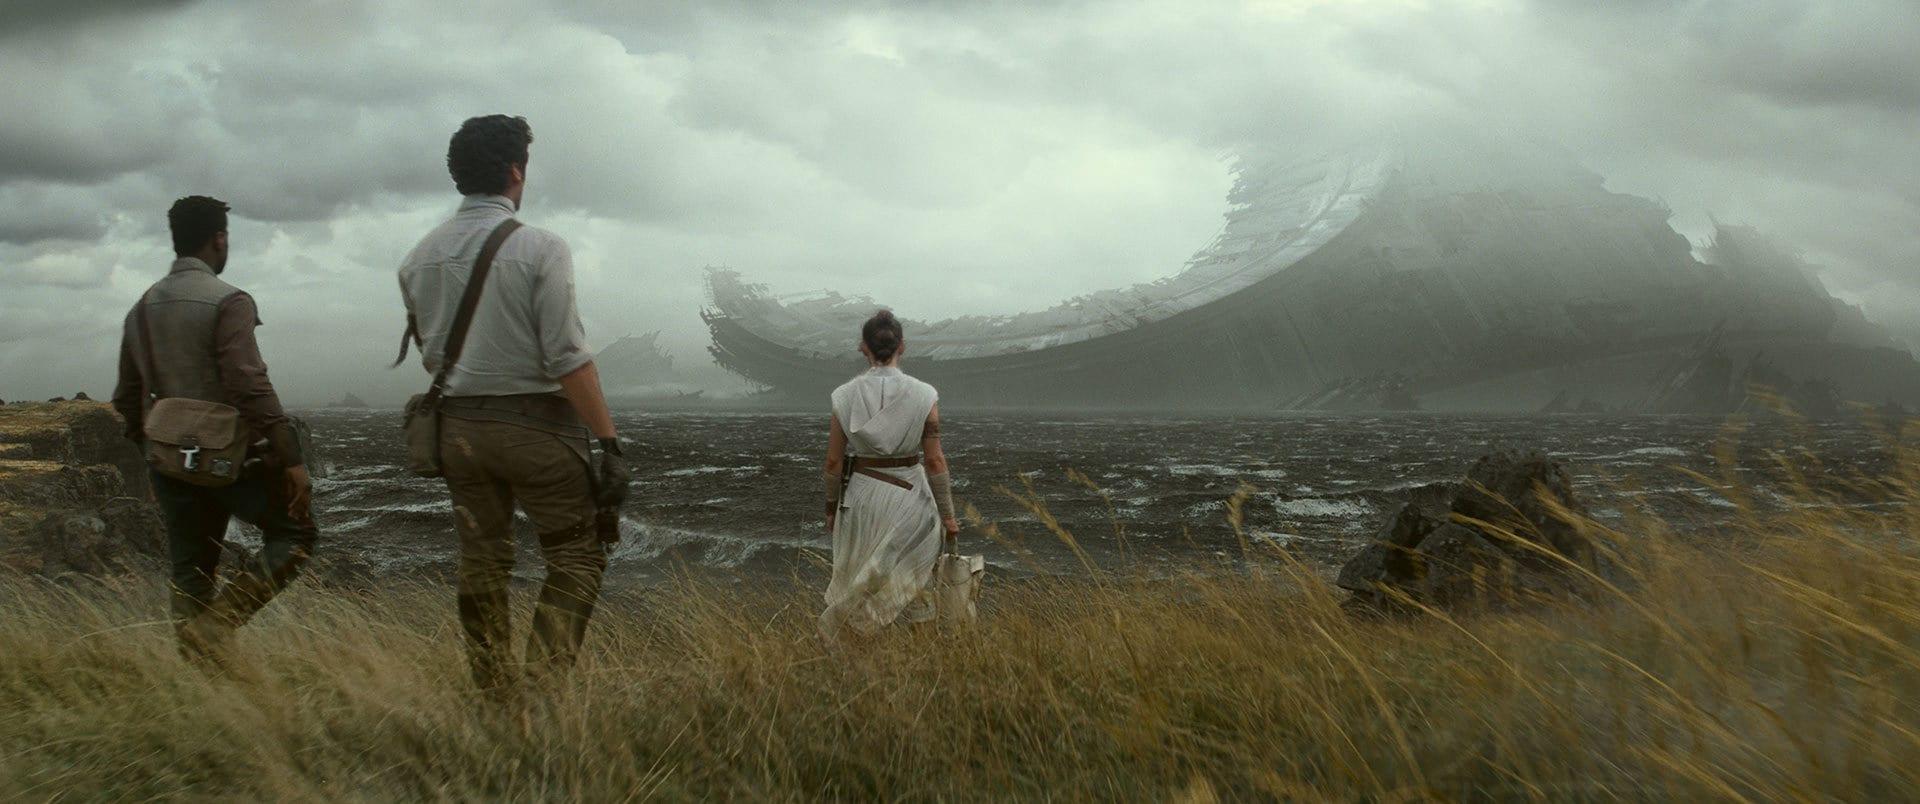 Star-Wars-the-Rise-of-Skywalker-Blogbericht-Rey-Poe-Finn-Todesstern-Disney-Lucasfilm